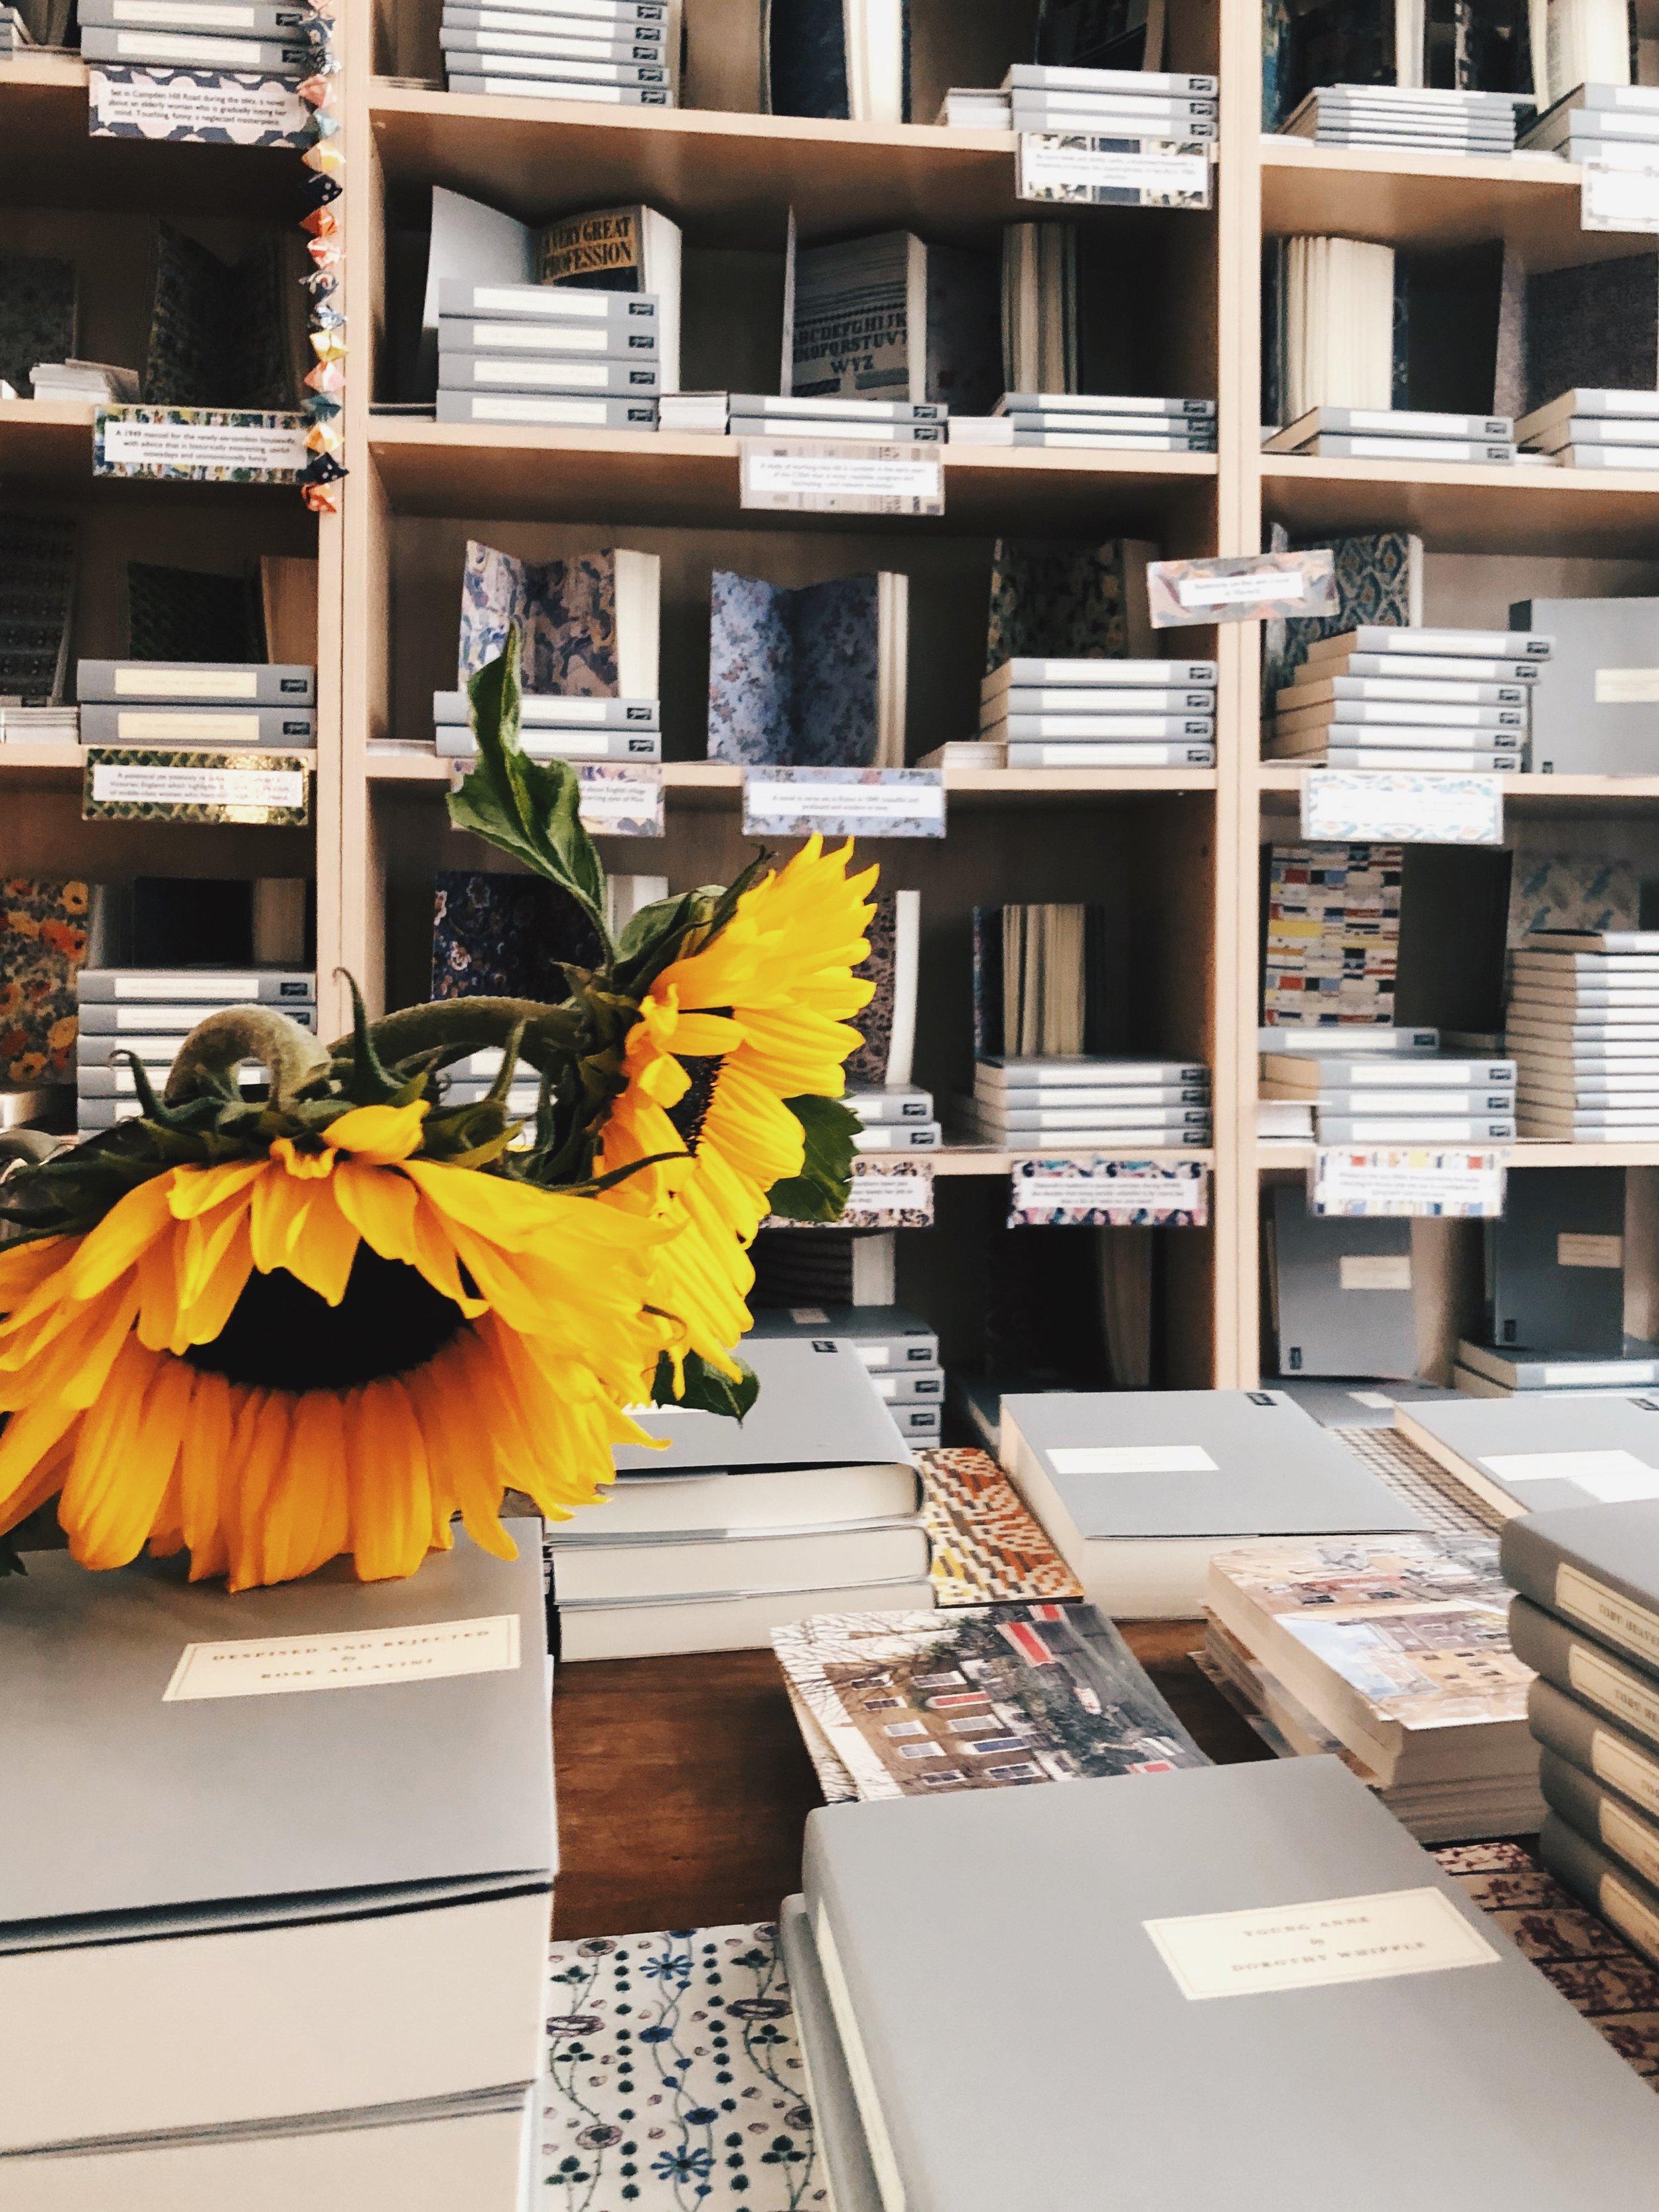 Persephone Books. Photo courtesy of M. A. McCuen.